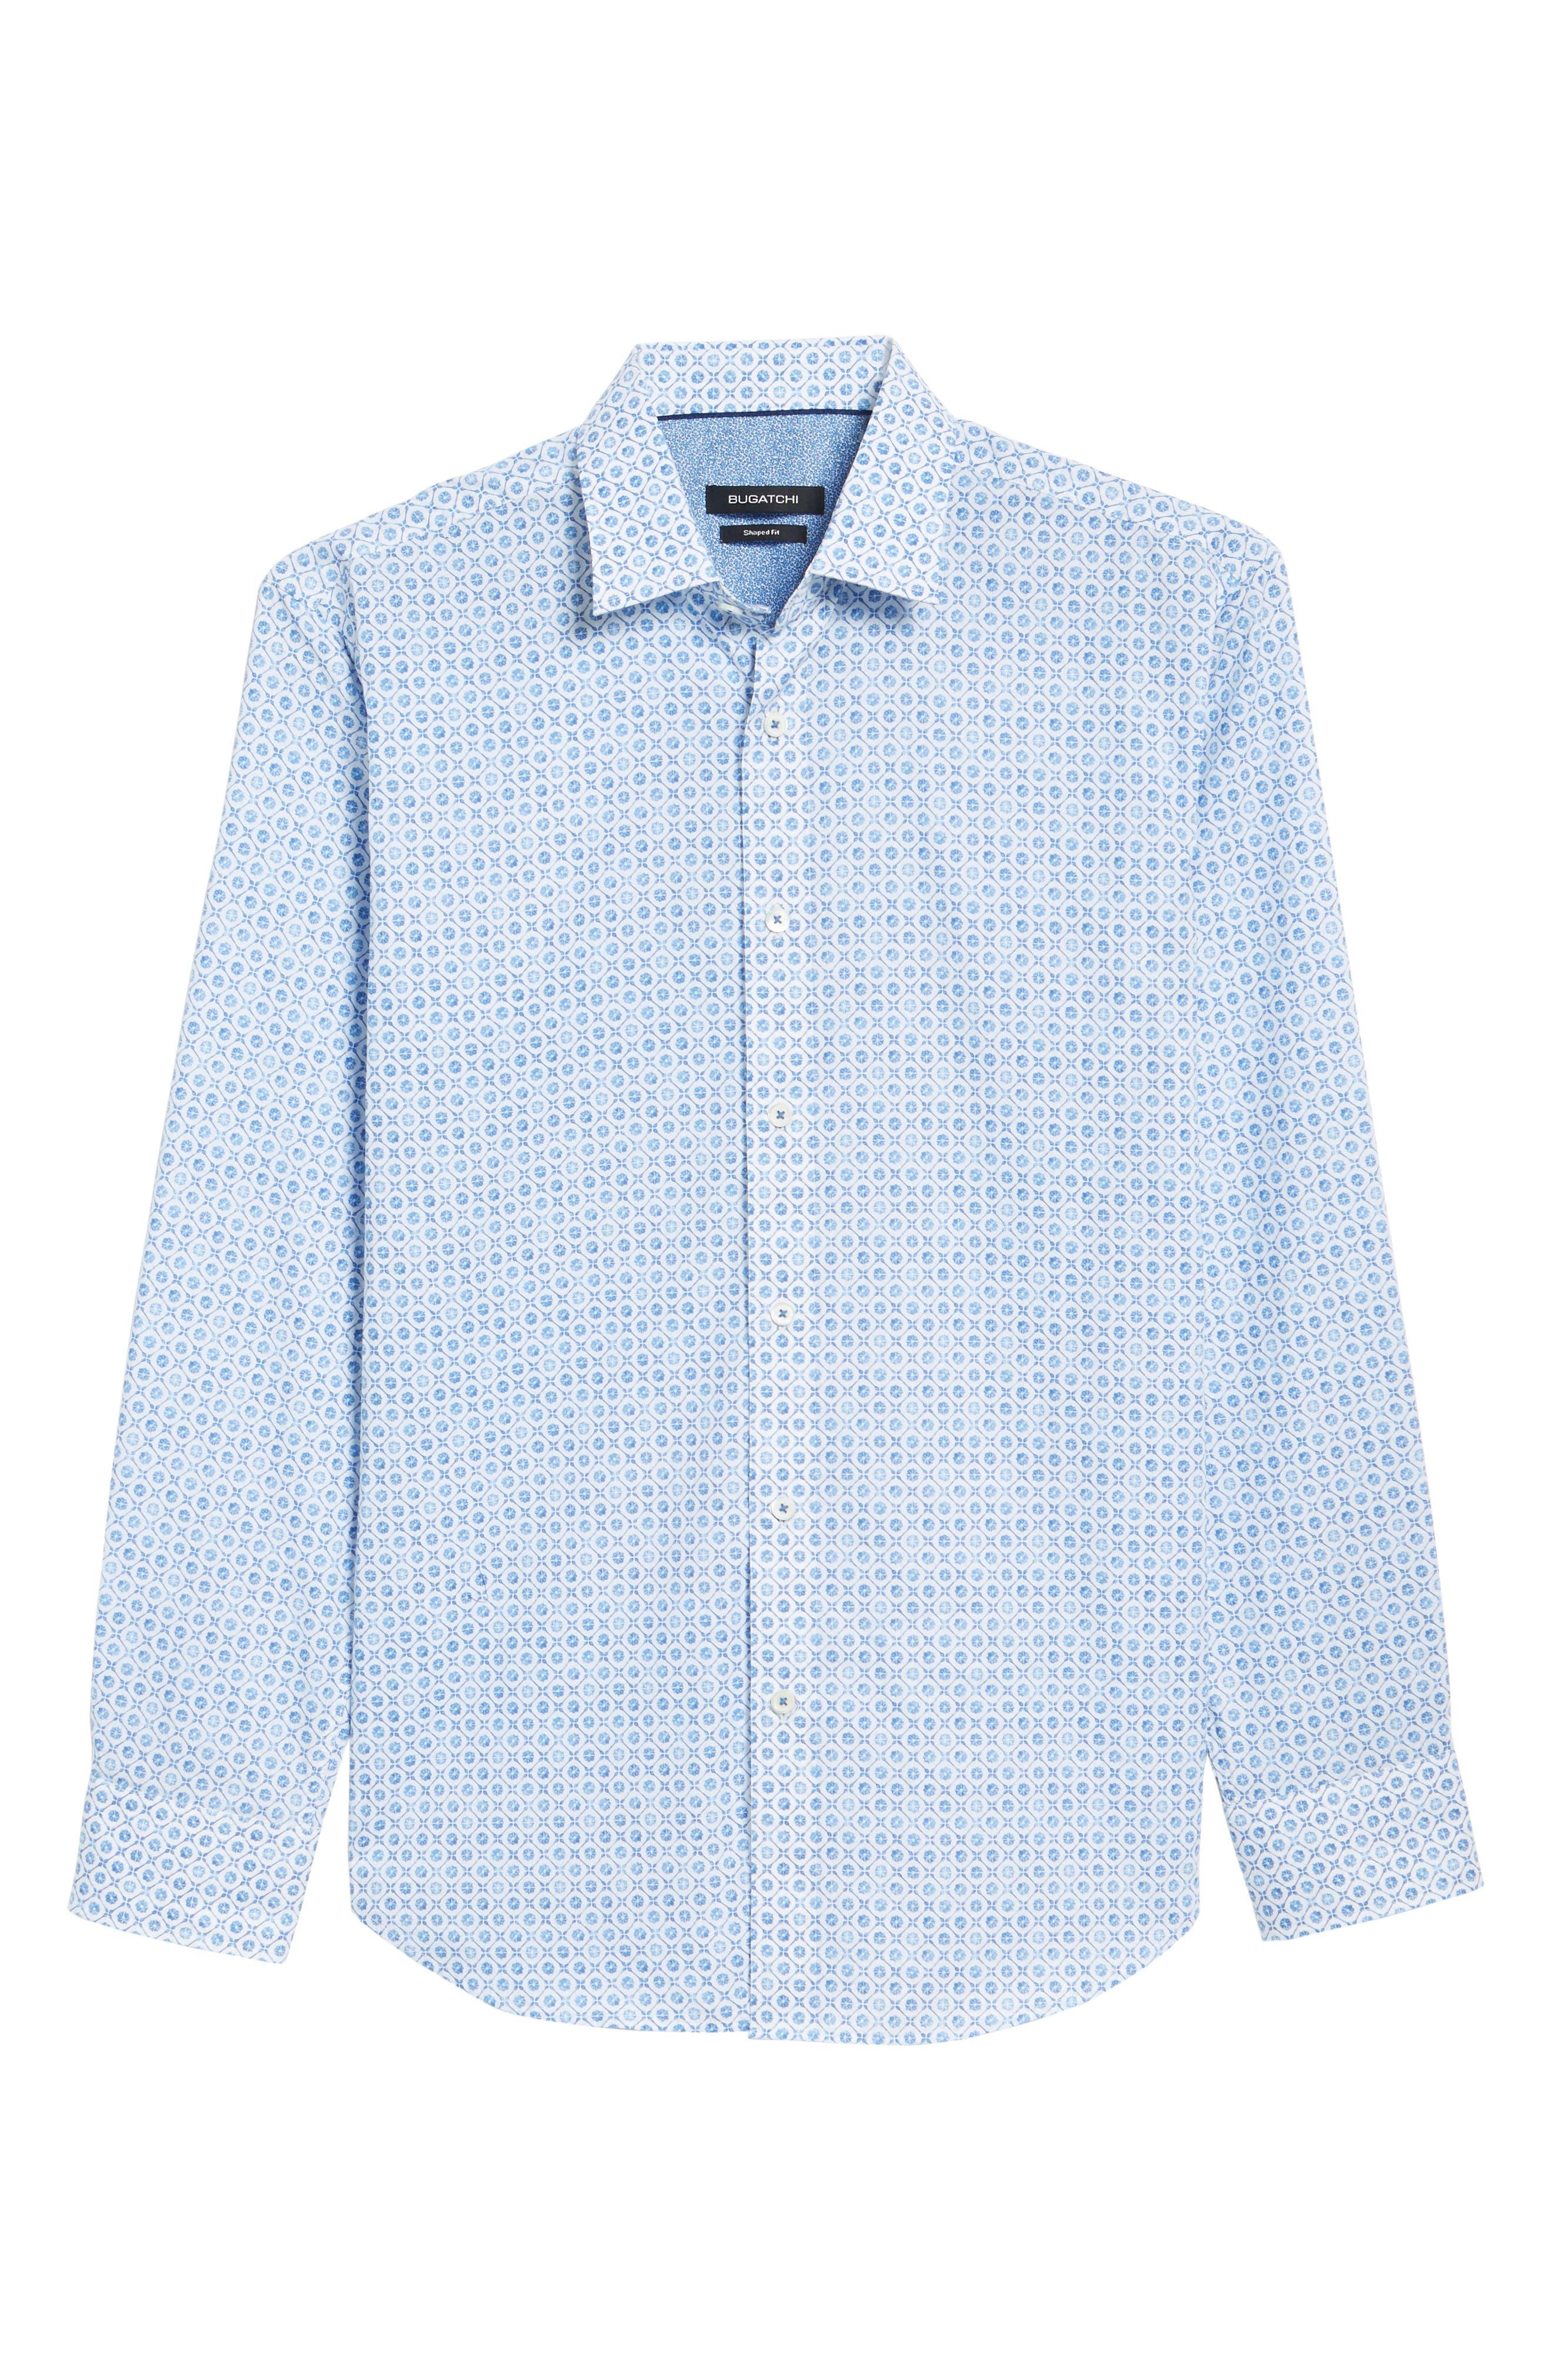 Shaped Fit Floral Medallion Print Sport Shirt,                             Alternate thumbnail 6, color,                             CLASSIC BLUE